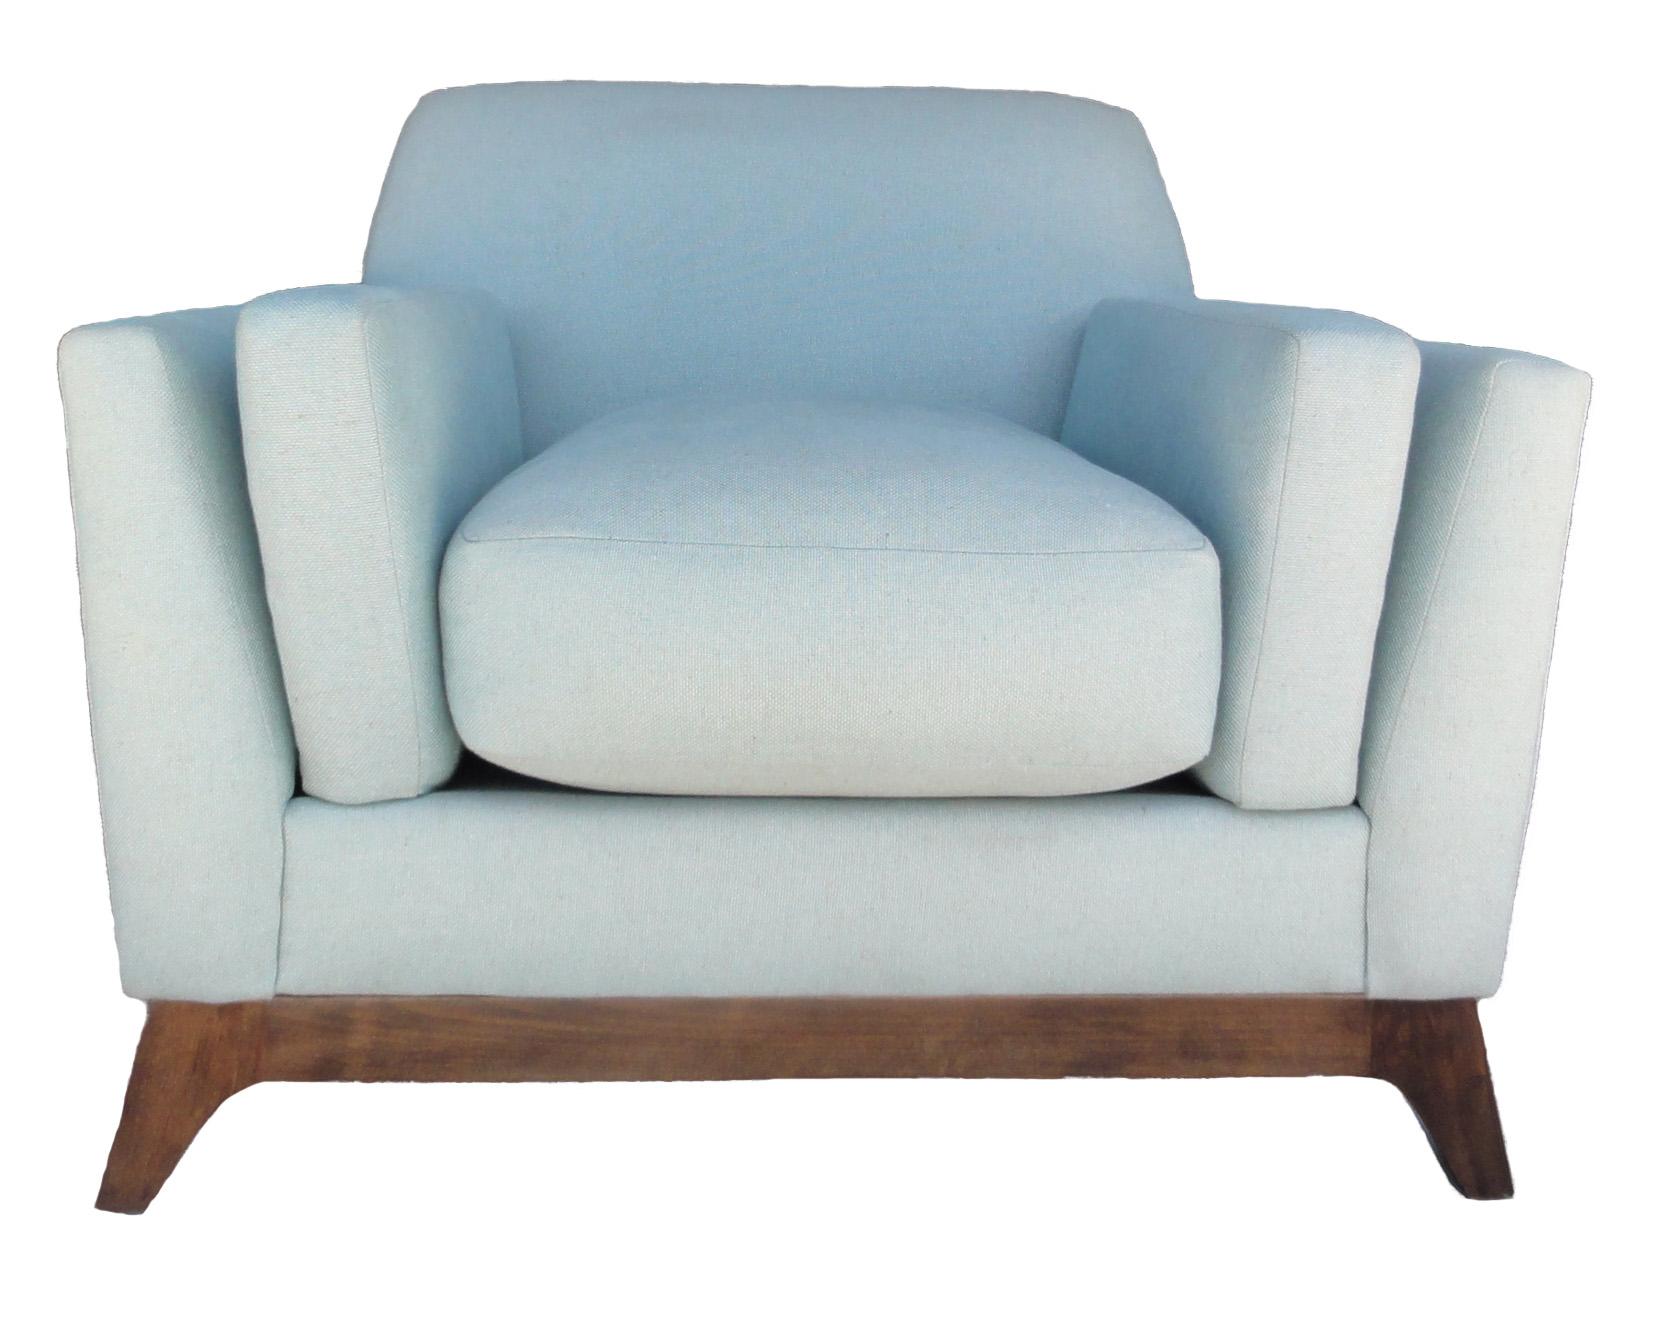 Century-chair-santa-barbara-design-center